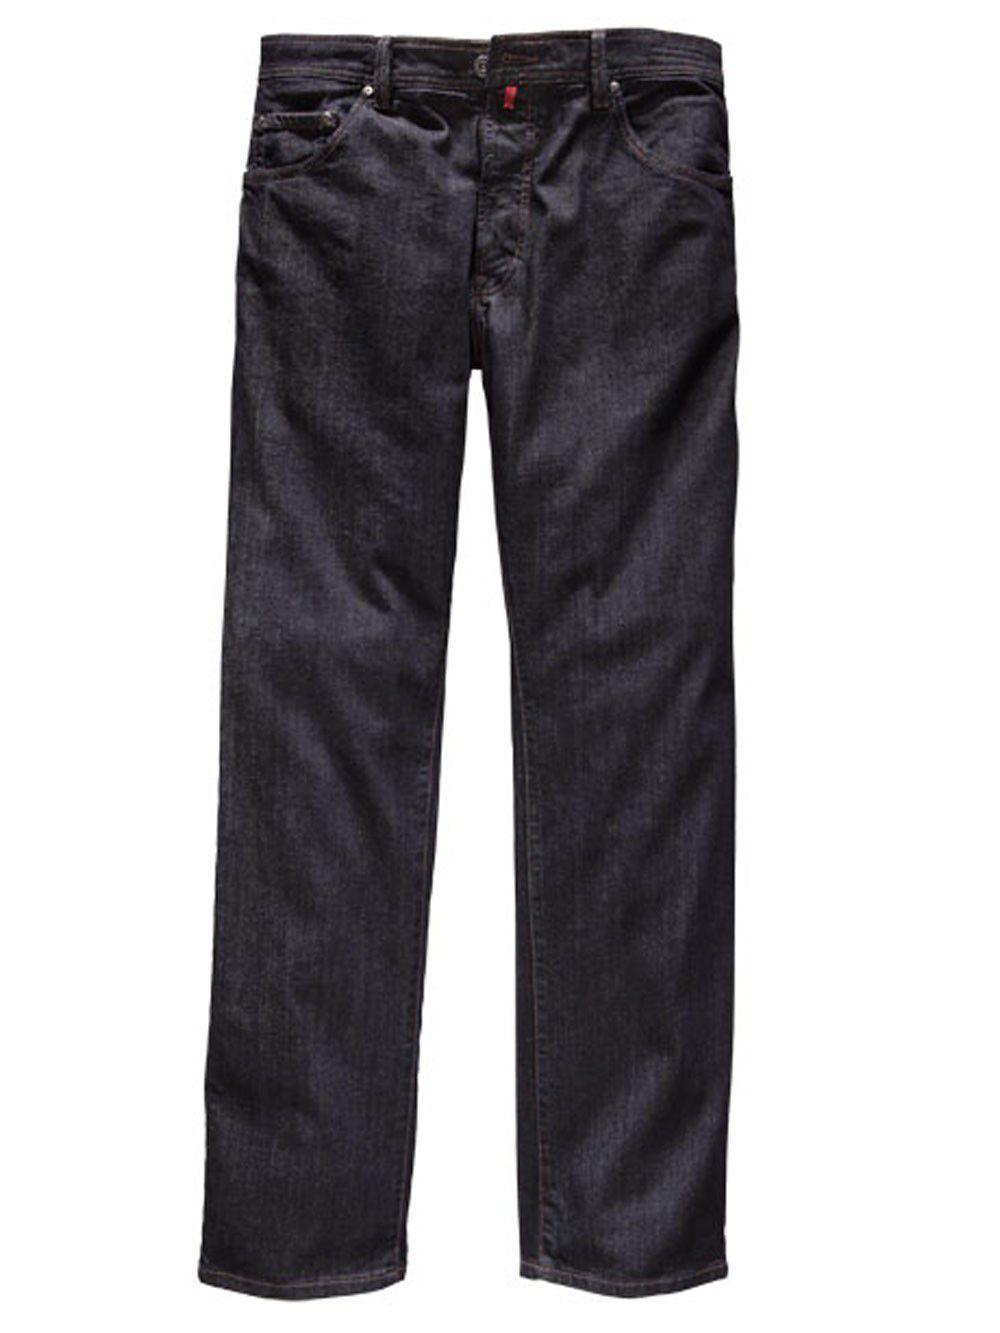 jeans pierre cardin mod le deauville gris kebello com. Black Bedroom Furniture Sets. Home Design Ideas